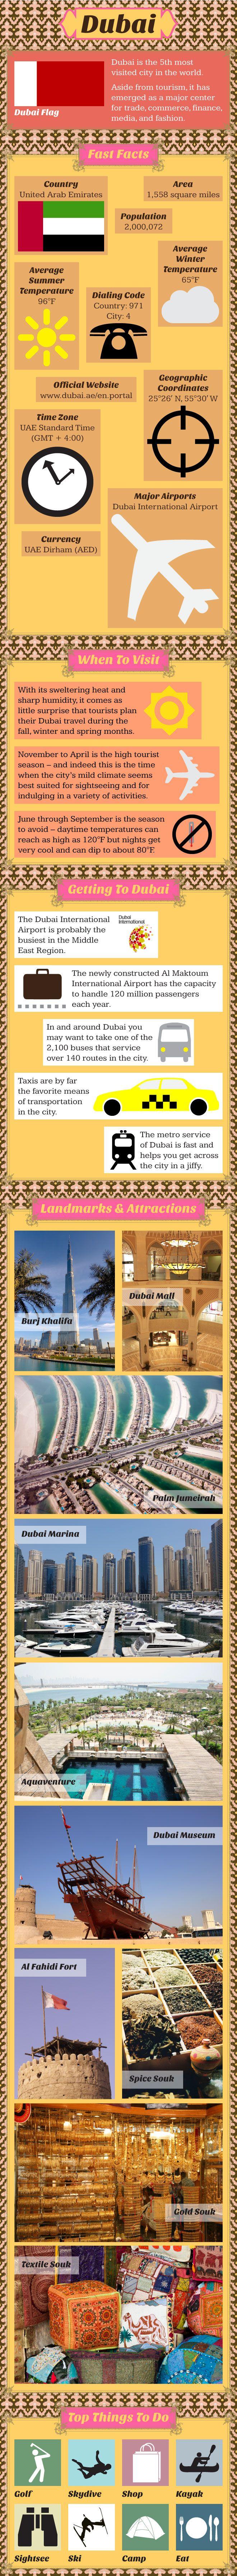 Dubai Infographic